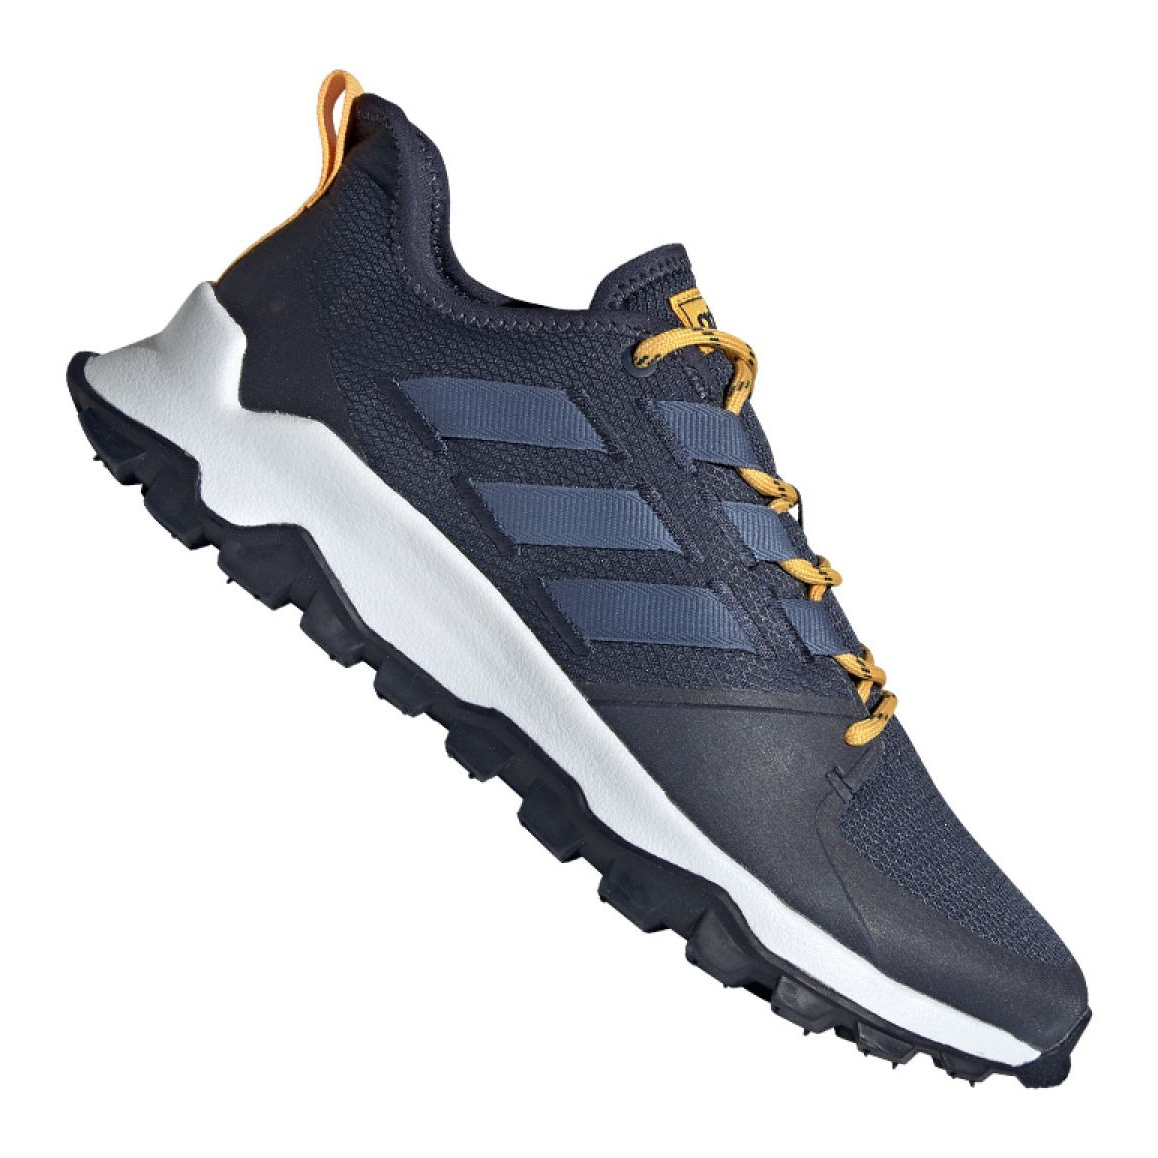 doppio coupon bambino designer nuovo e usato Scarpe da running adidas Kanadia Trail M EE8183